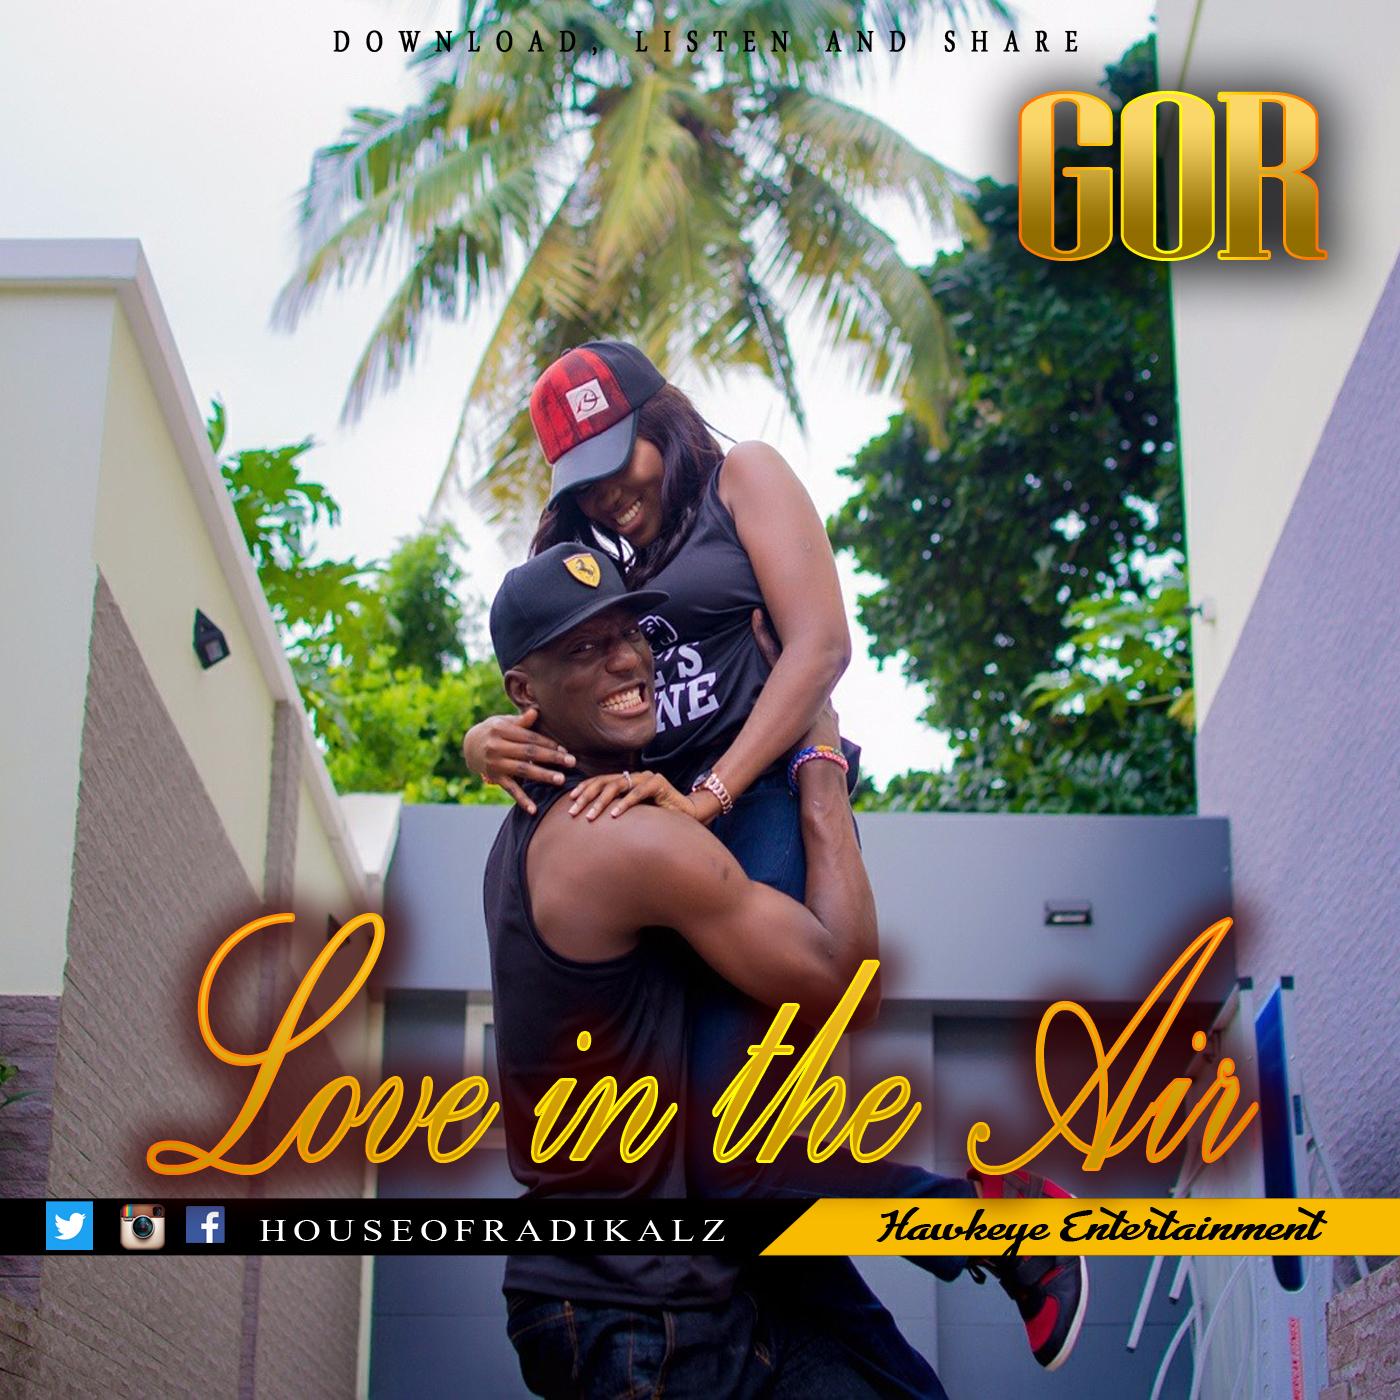 Love In The Air - GOR (5) [@houseofradikalz]